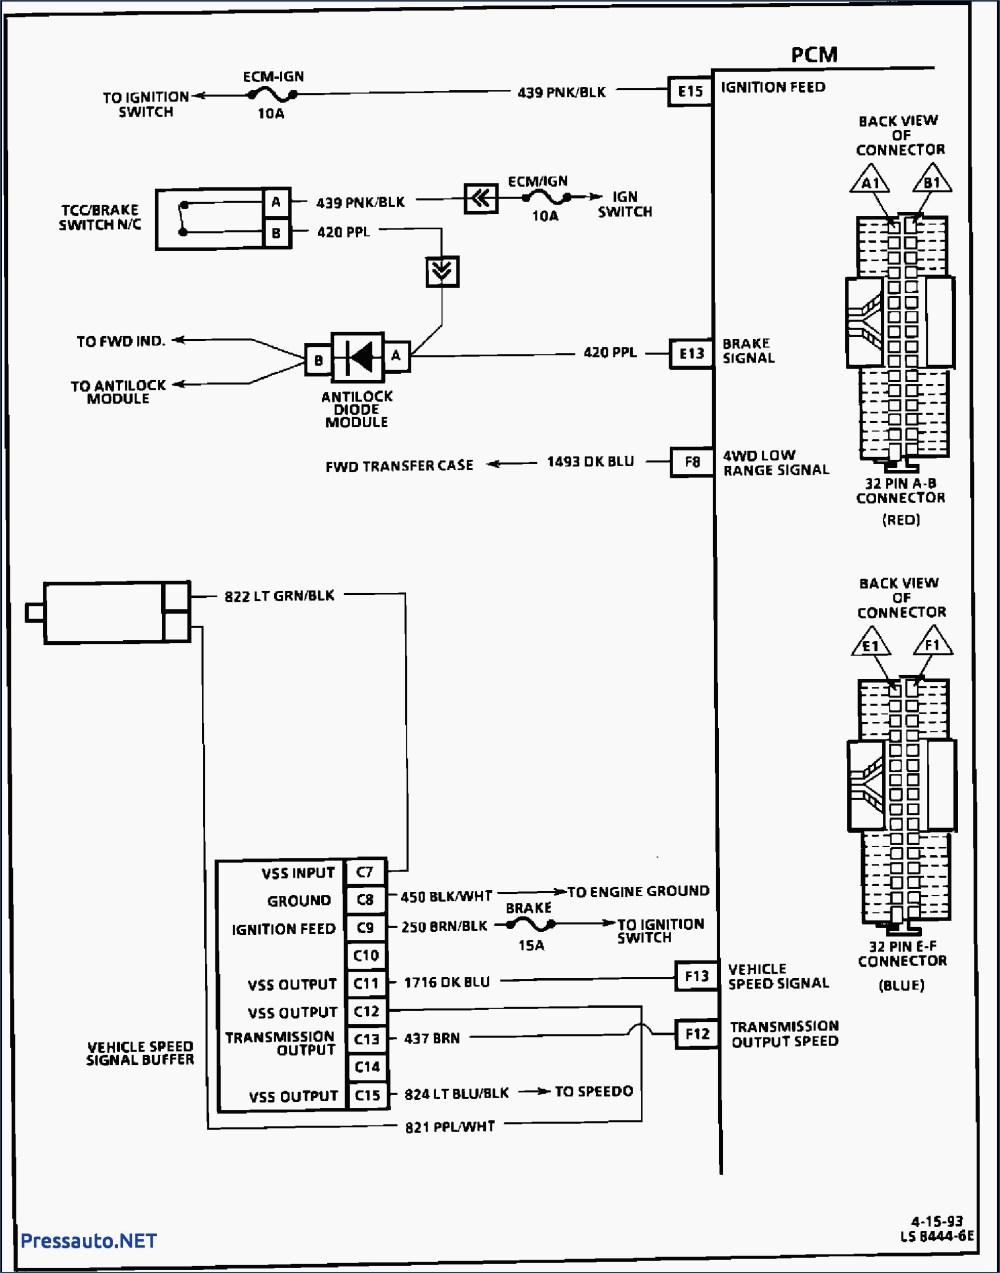 medium resolution of 1992 4l80e wiring diagram wiring diagram1992 4l80e wiring diagram wiring diagram database4l80e wiring diagram 20 10